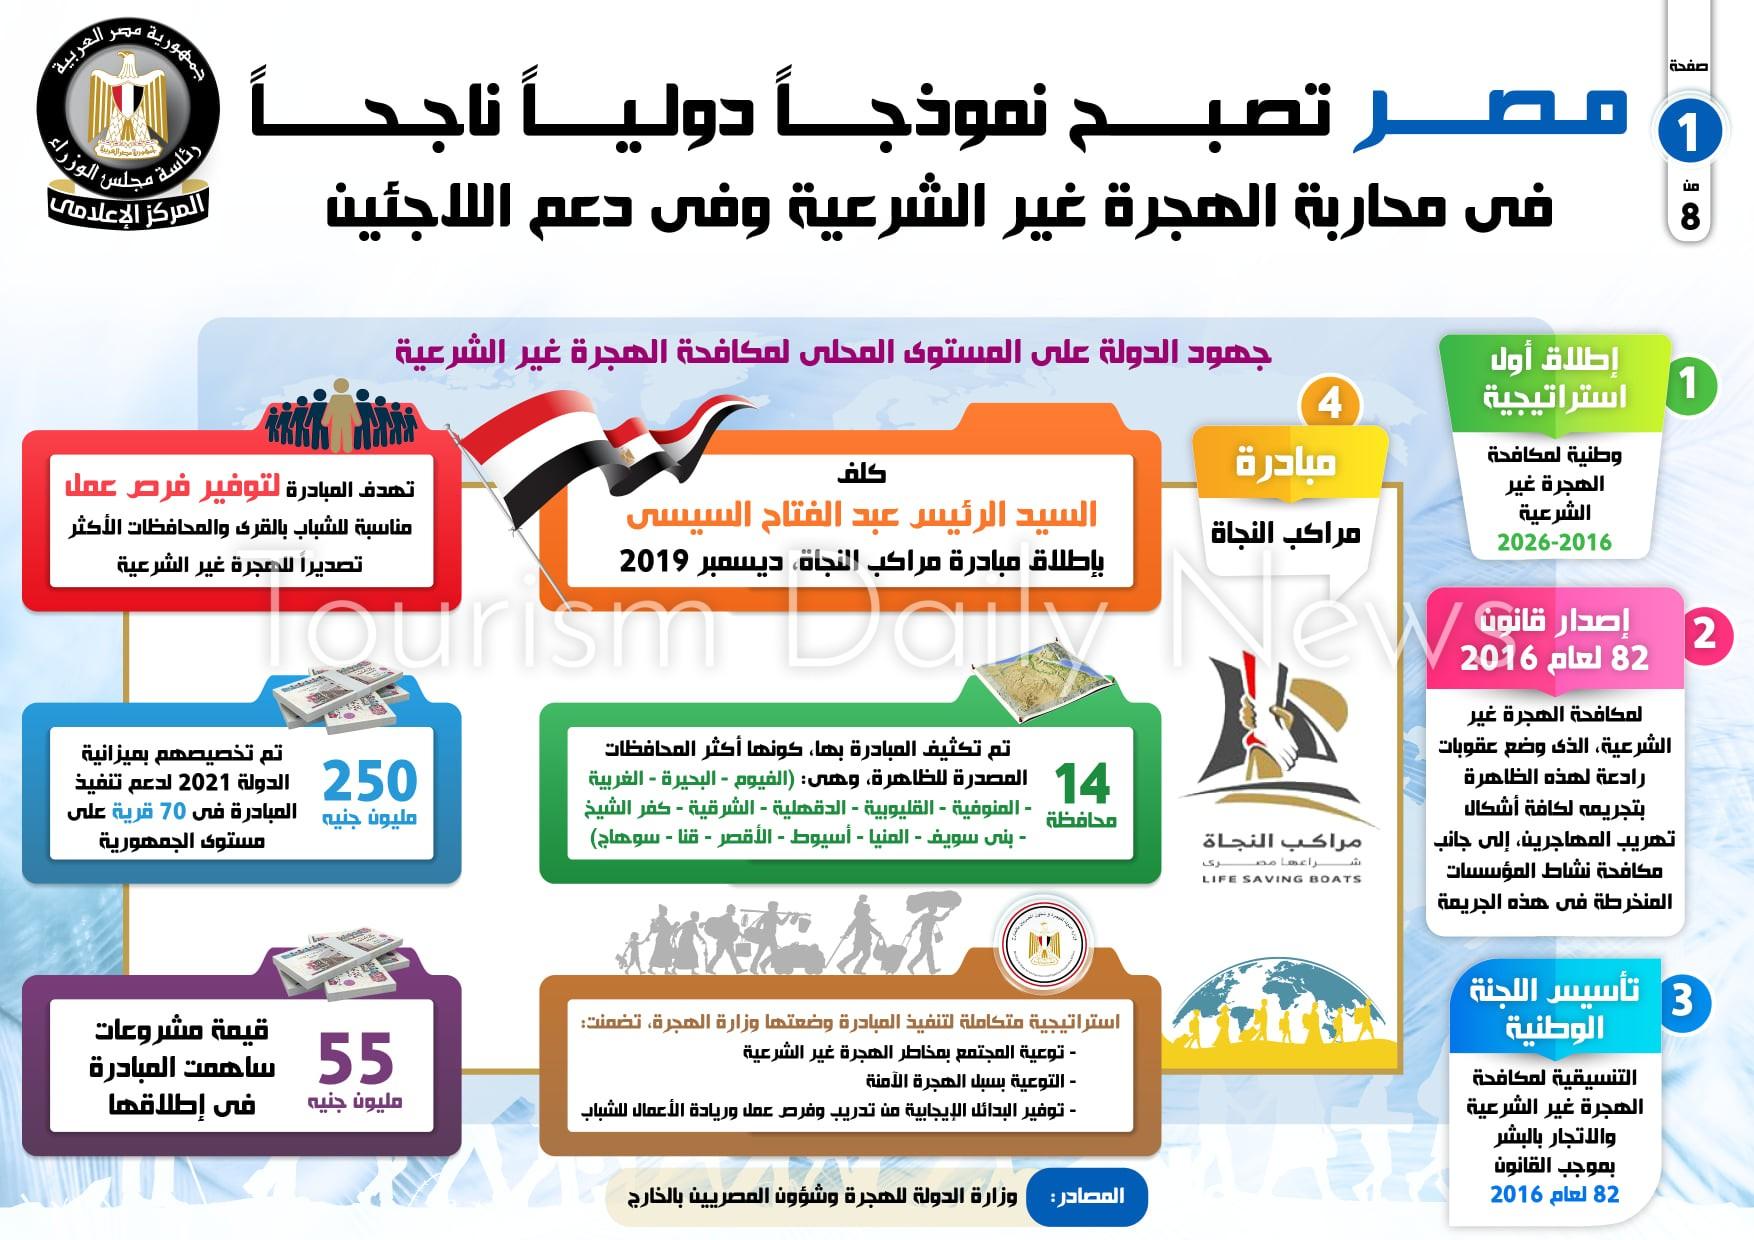 مصر نموذج دولي